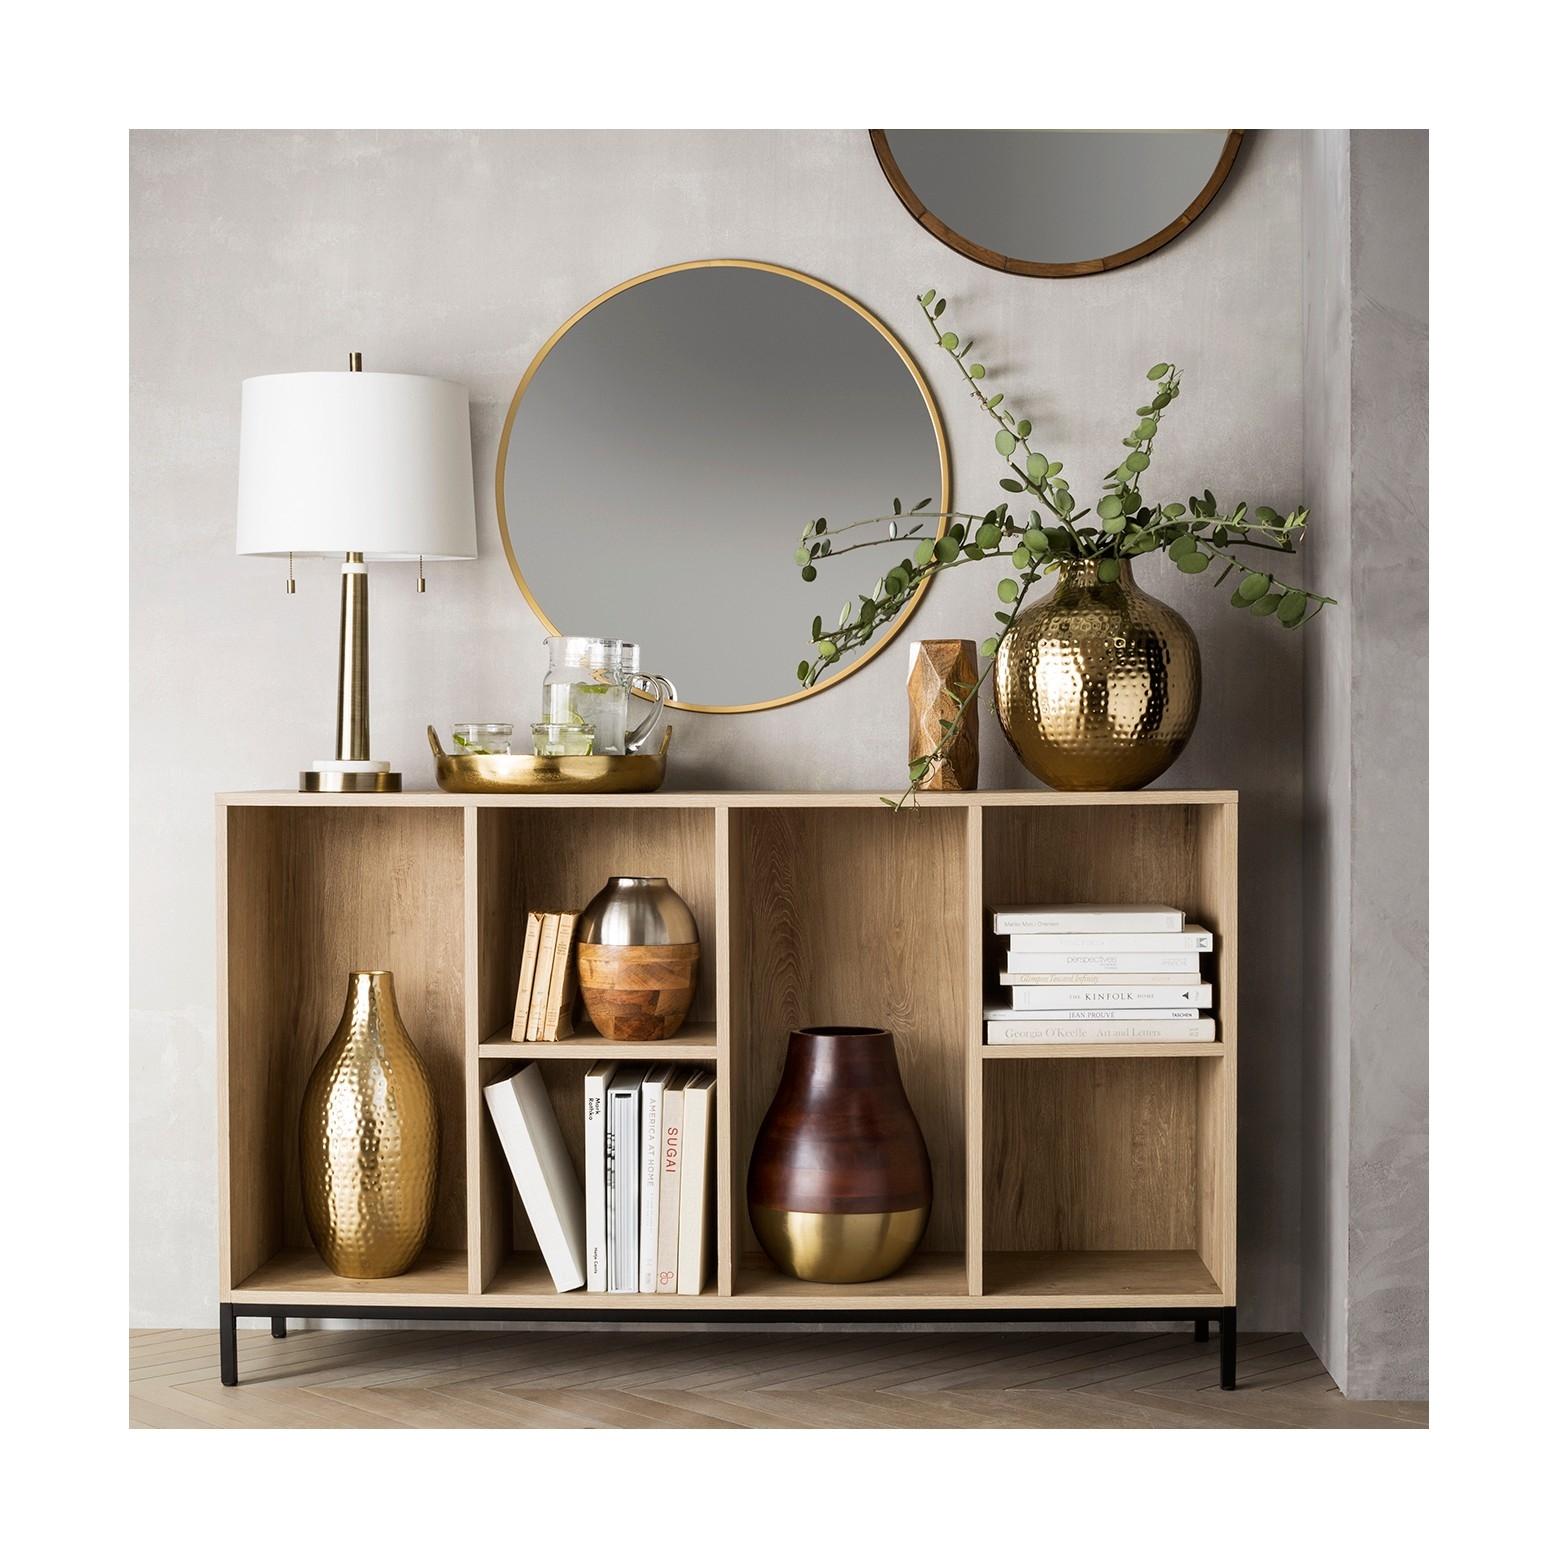 Thresholdtm Wall Shelf With Mirror